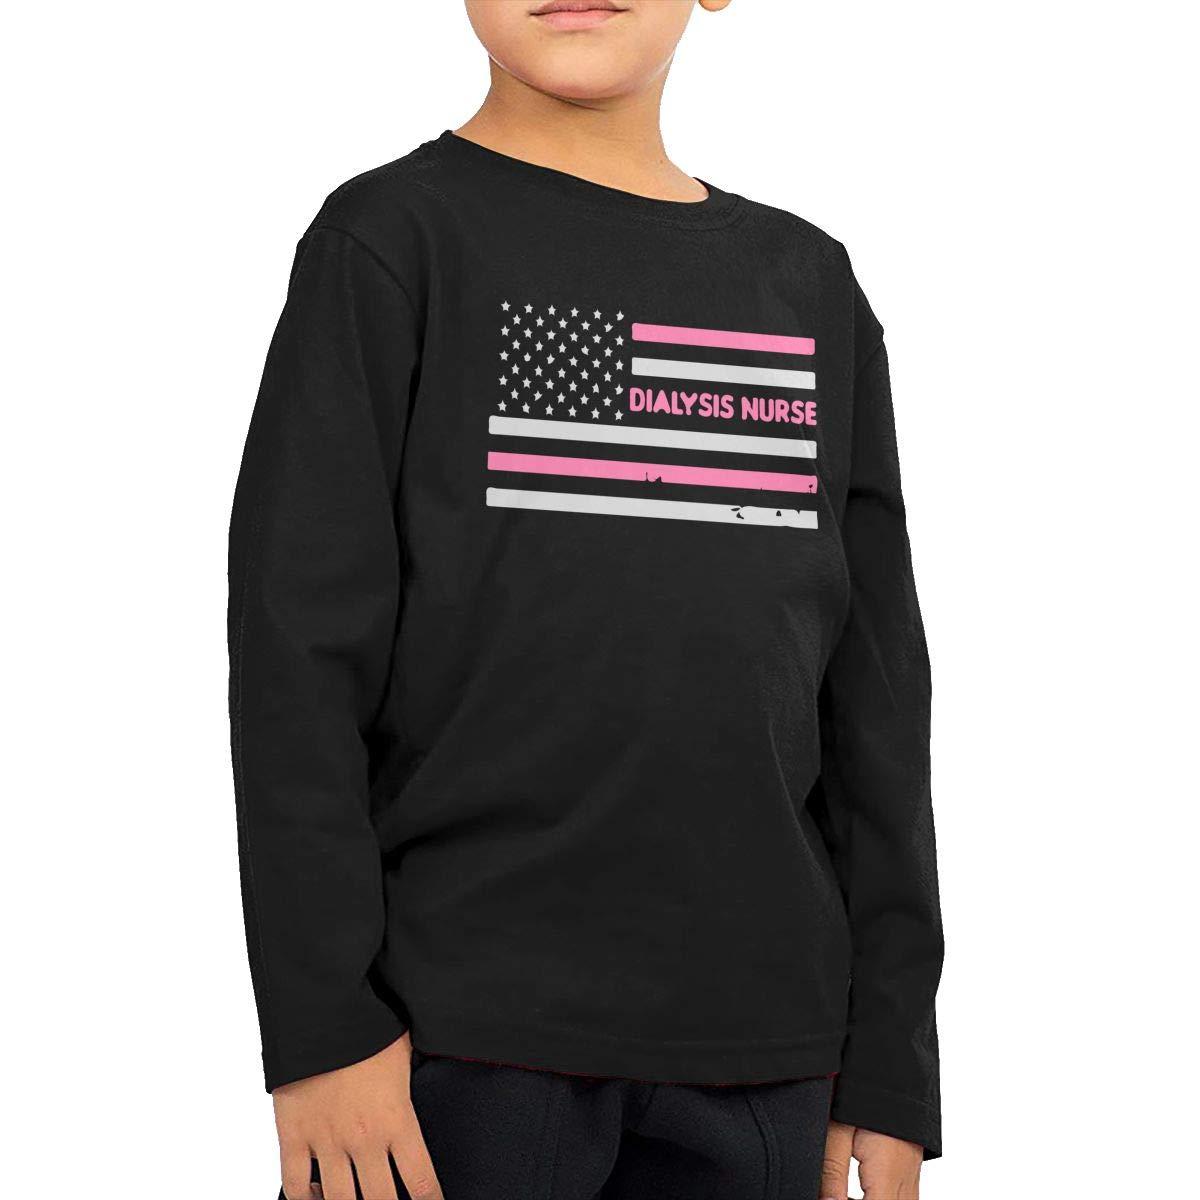 Dialysis Nurse American Flag1 Novelty Toddler Children Baby Boys Girls Long Sleeve Shirt Tops